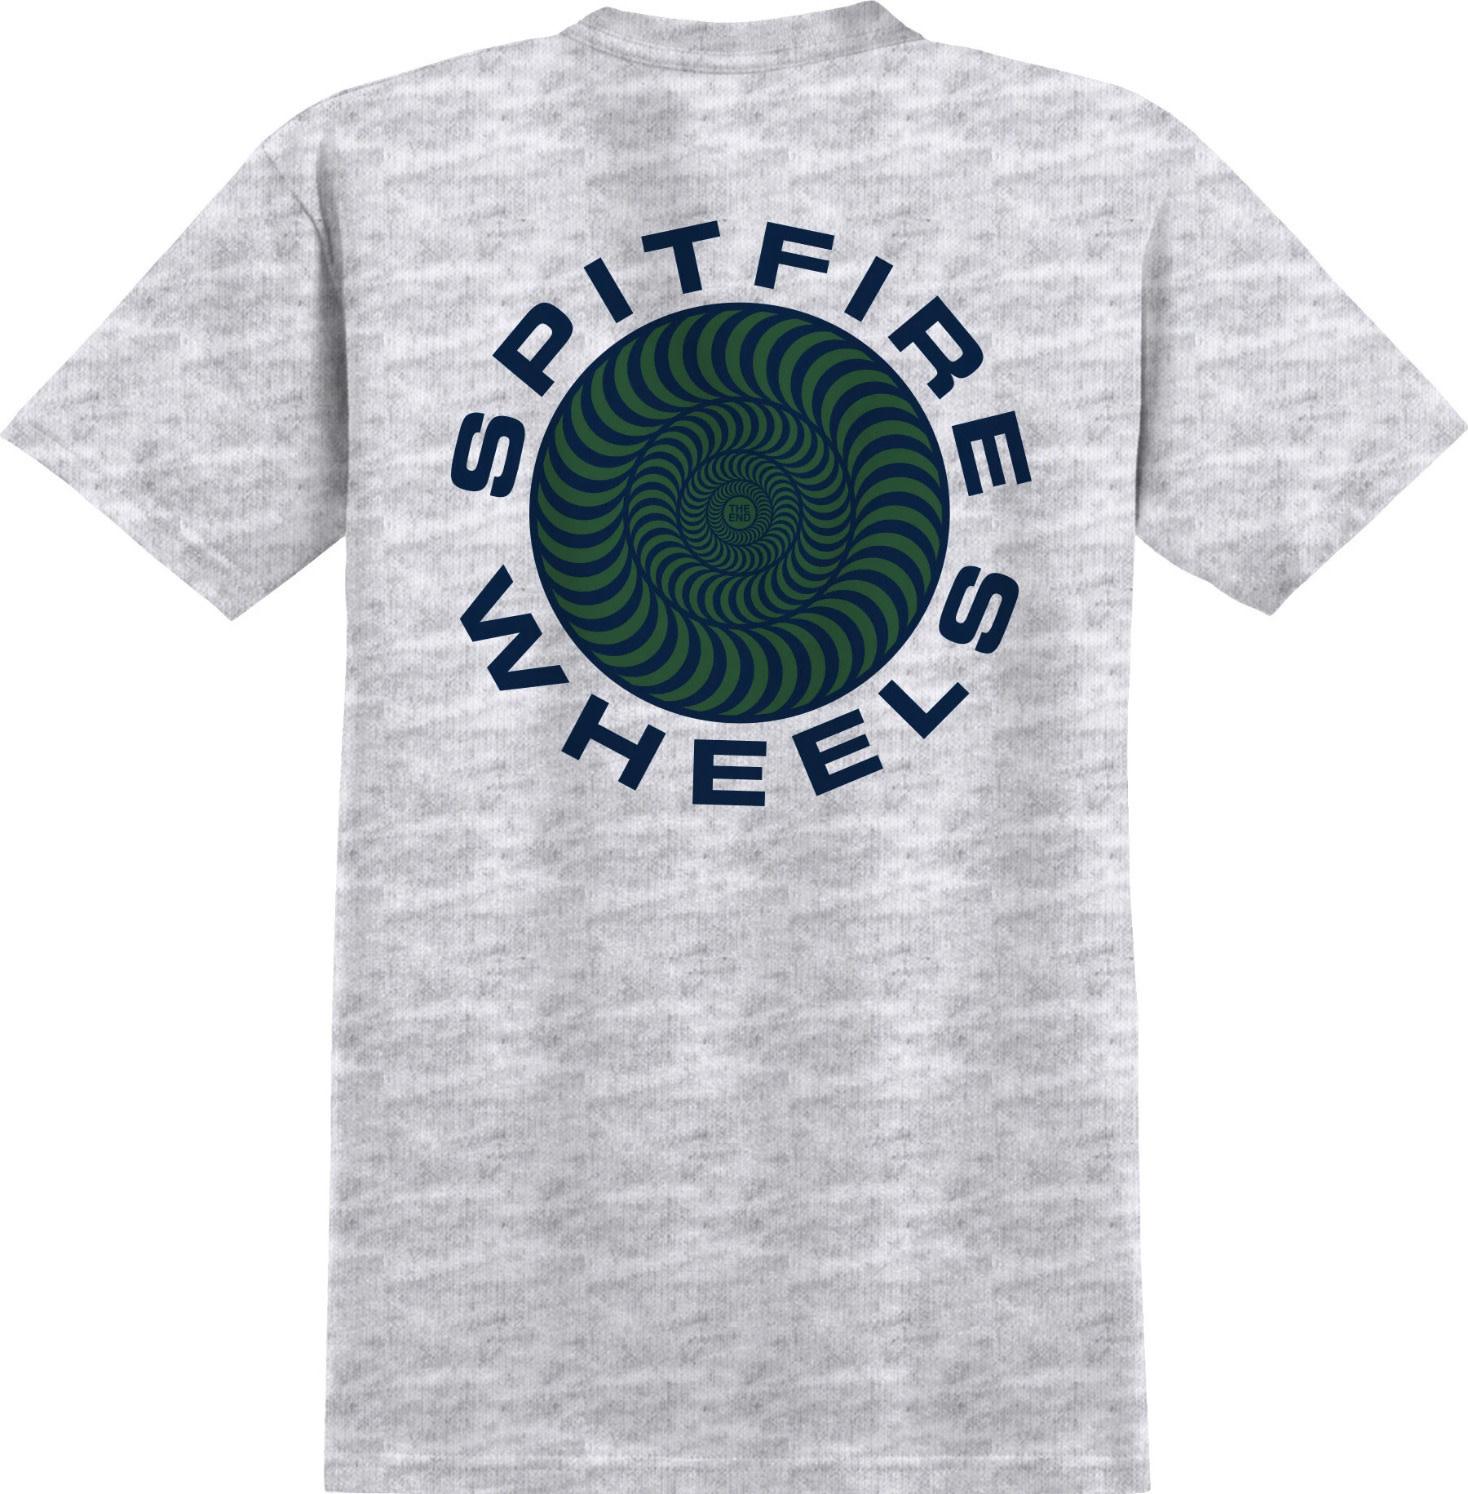 Spitfire Wheels Classic 87 Swirl Ash/Navy Tee